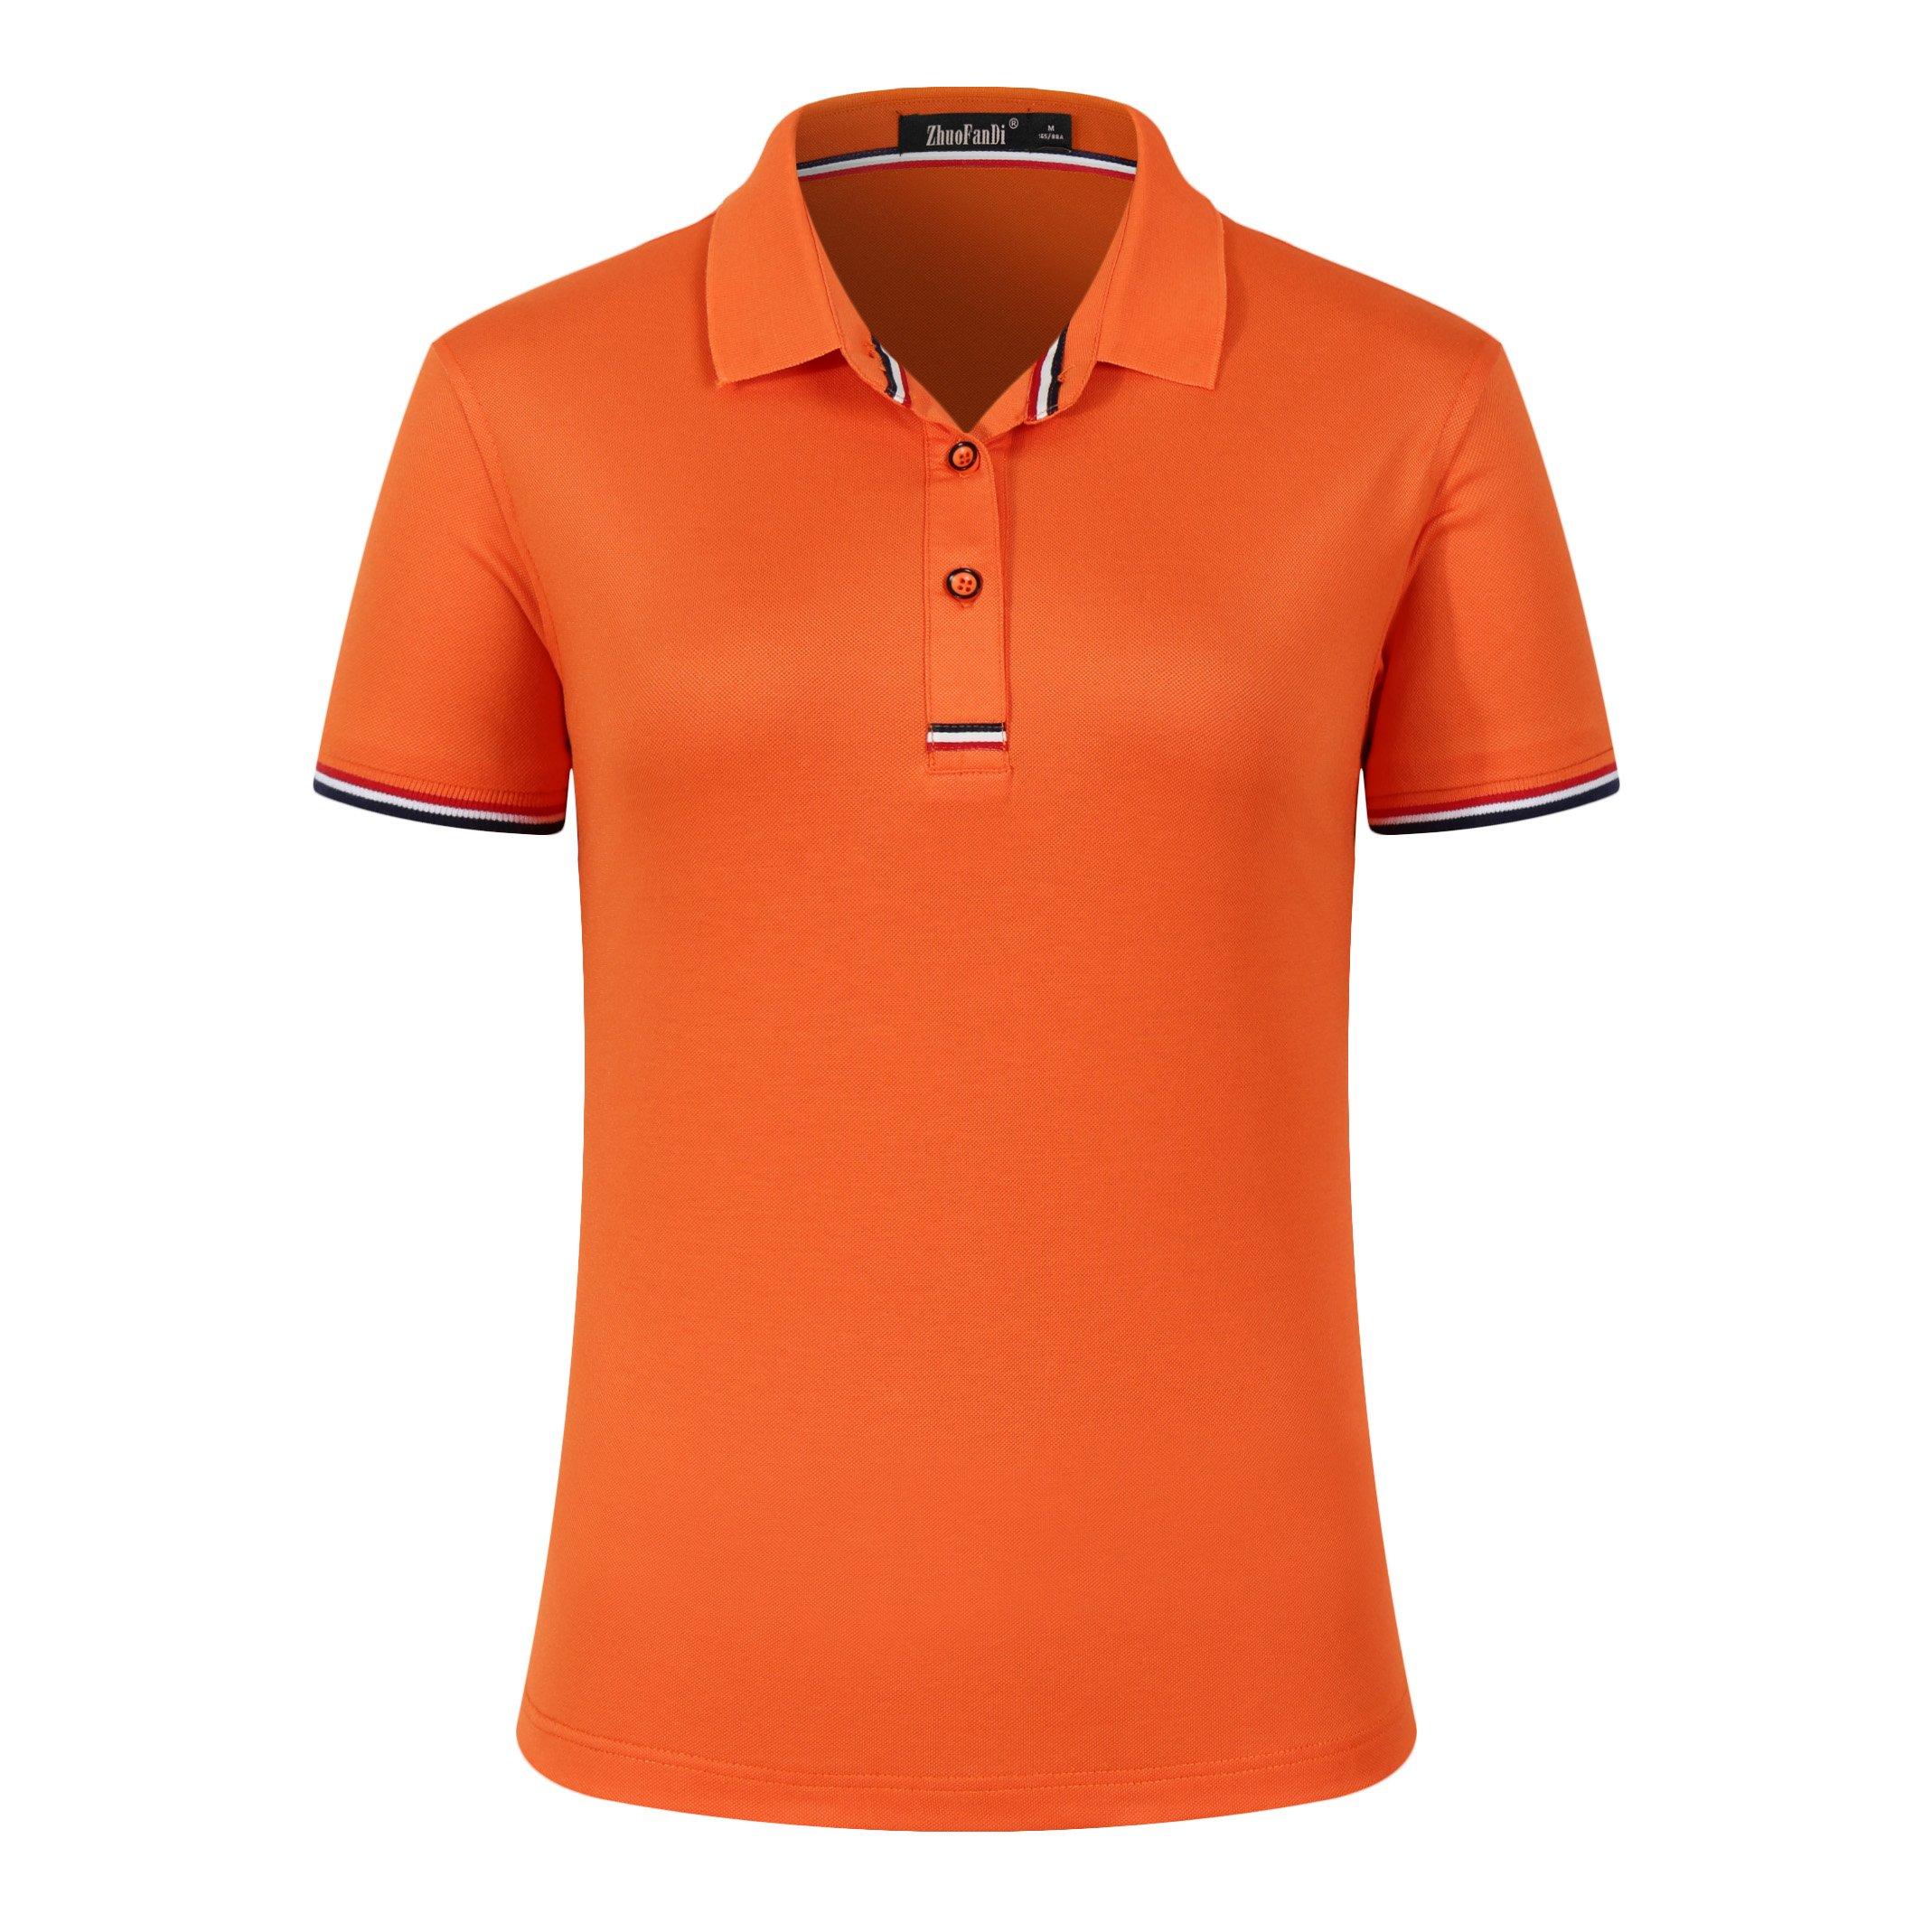 Mitario Femiego Women Classic Striped Collar Slim Fit Short Golf Polo Shirt Orange S